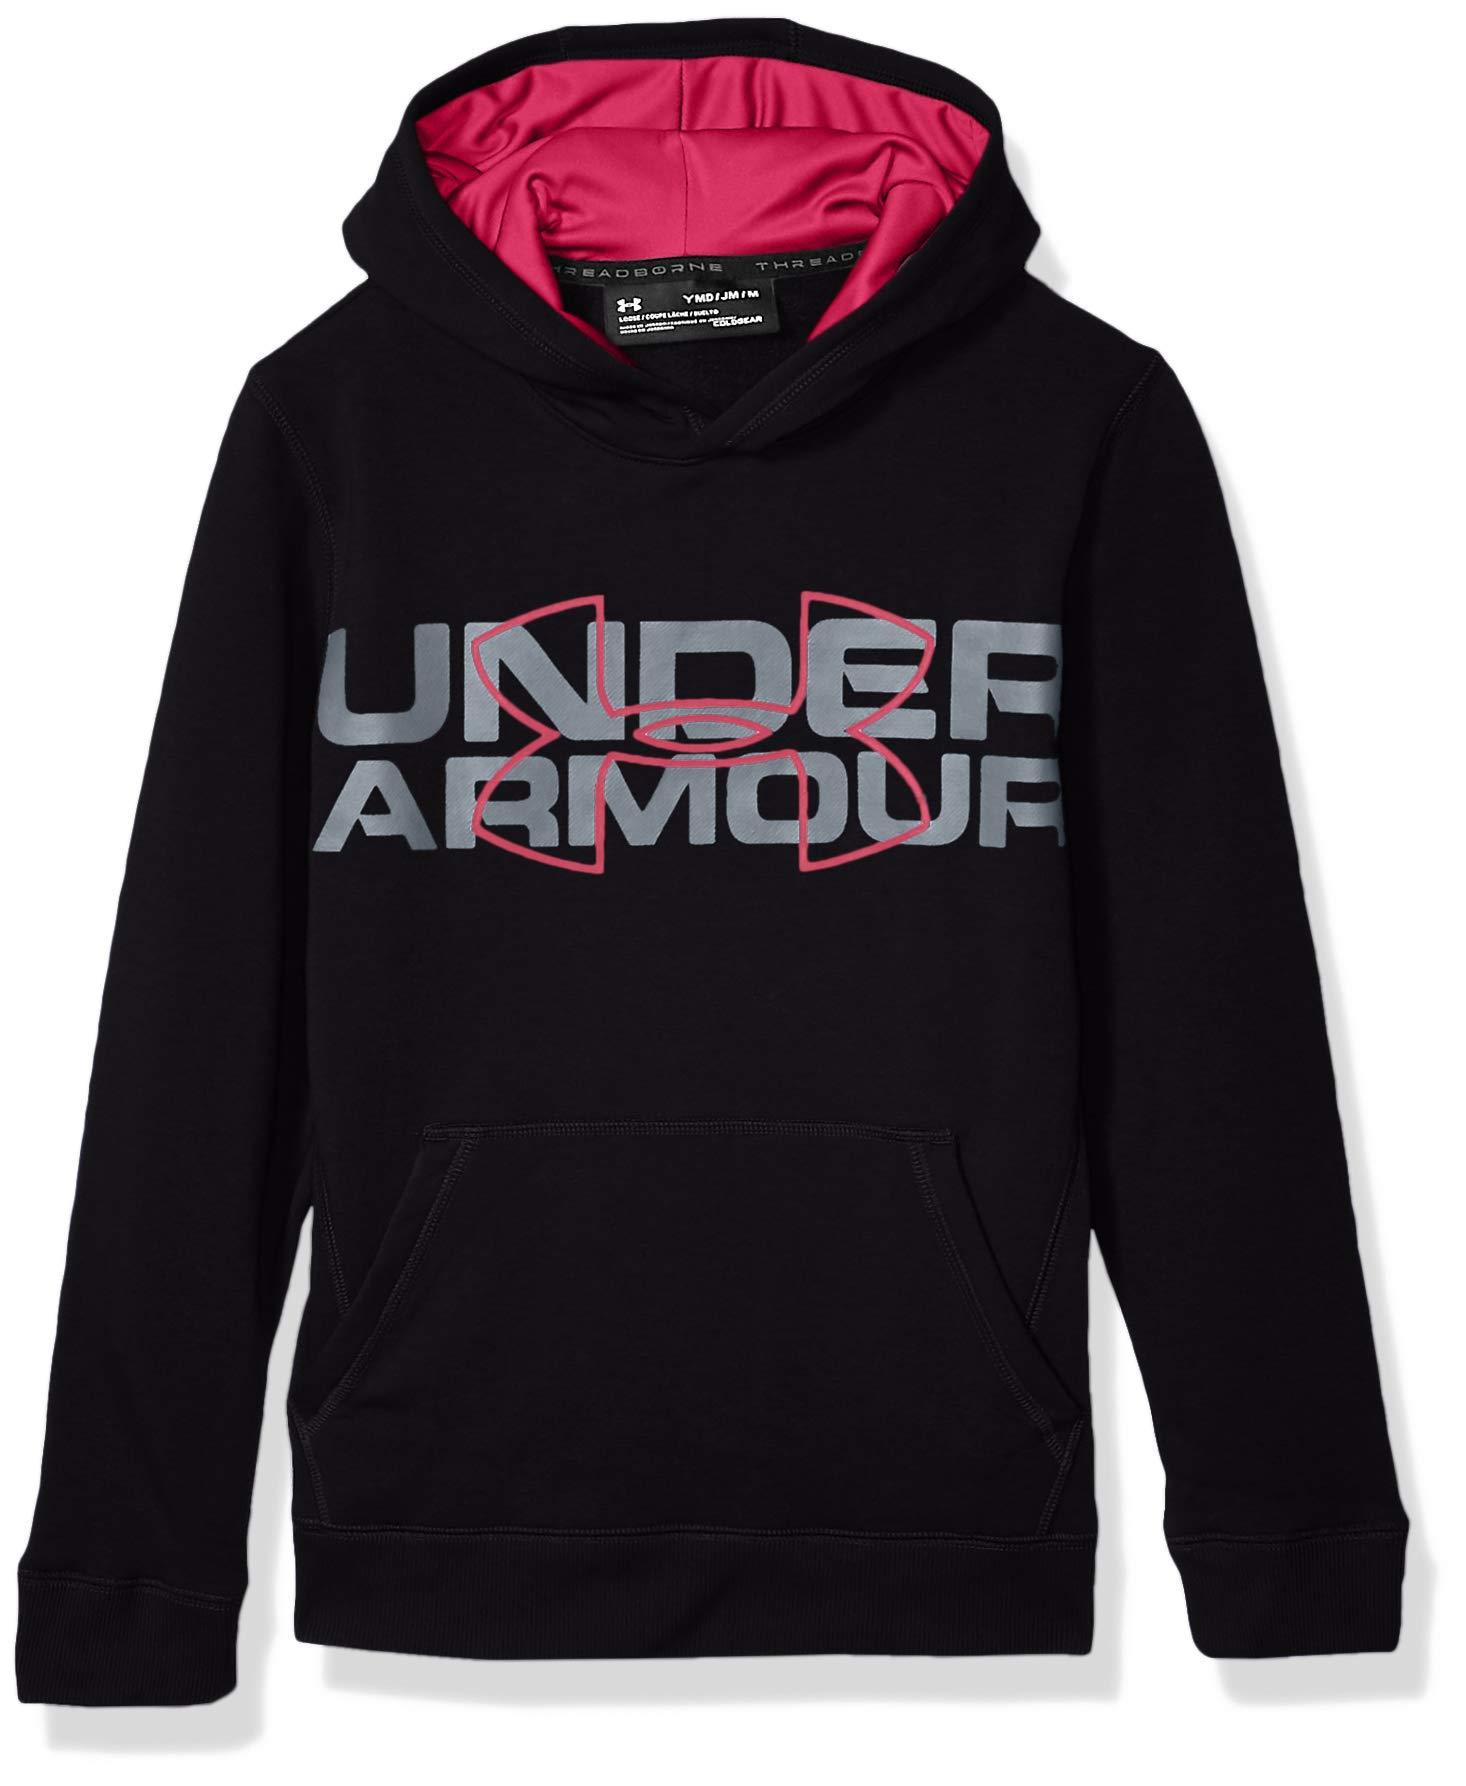 Under Armour Boys' Threadborne Logo Hoodie, Black /Tropic Pink, Youth Large by Under Armour